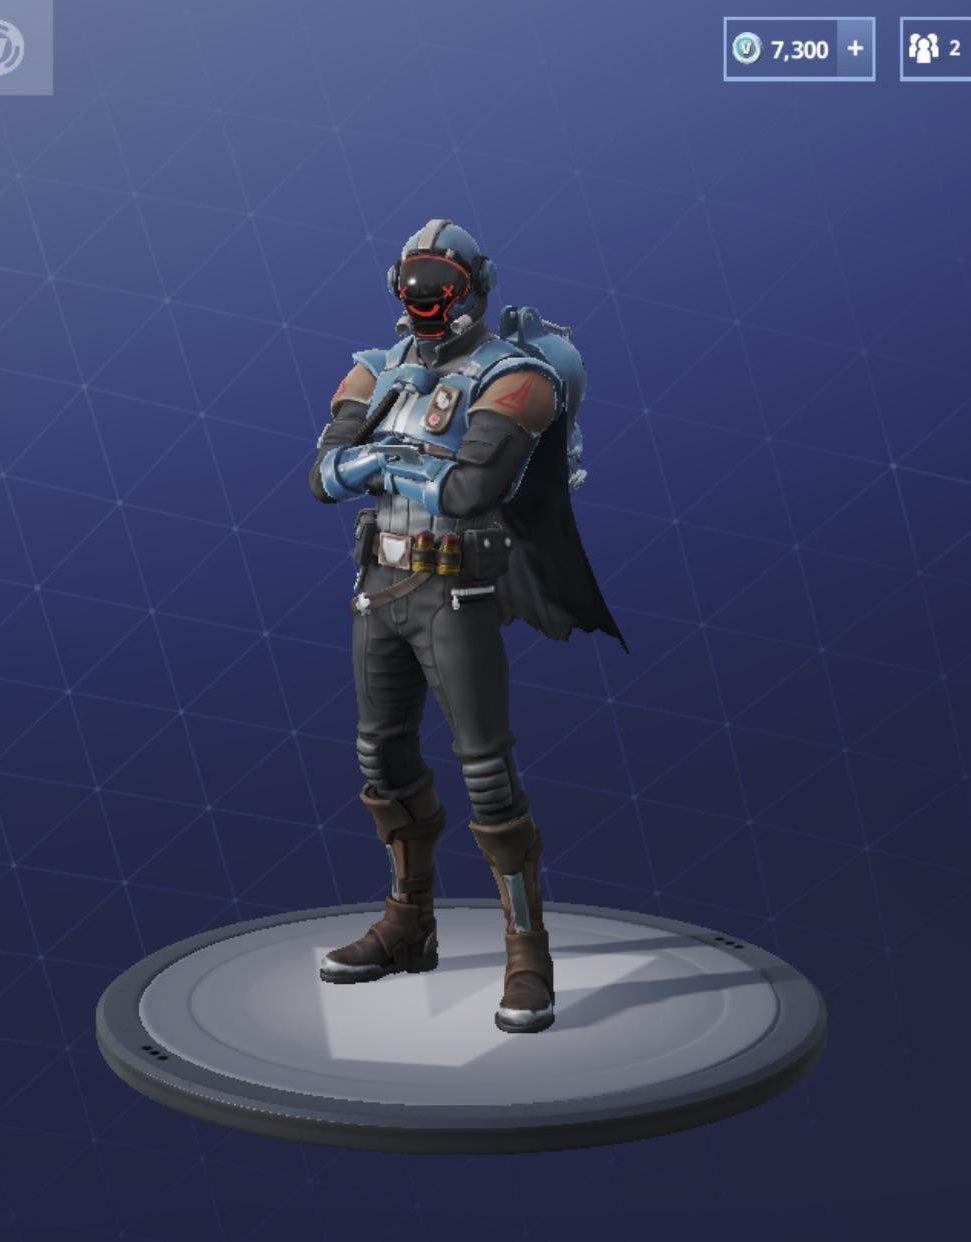 Blockbuster Skin - The Visitor